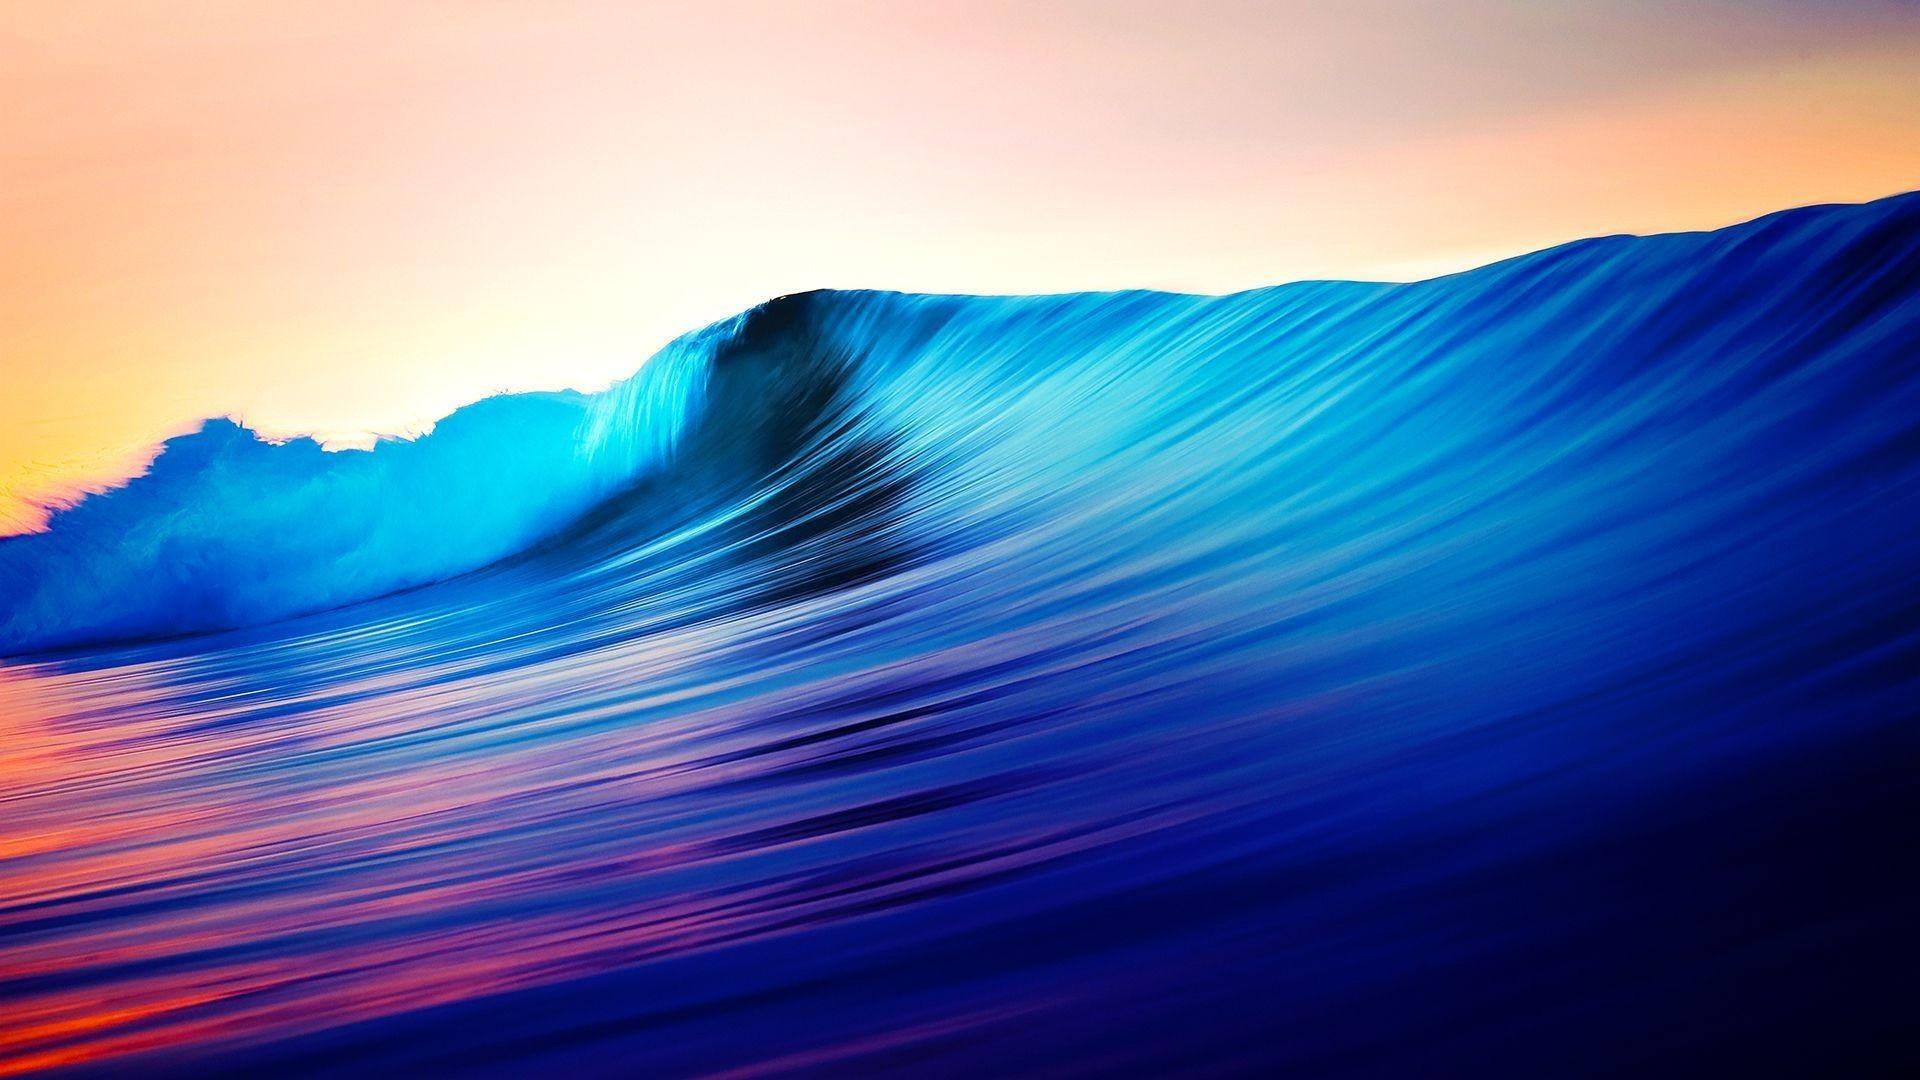 Oceans – Shiny Waves Sea Oceans Beautiful Nature Ocean Wallpaper Windows 7  for HD 16: